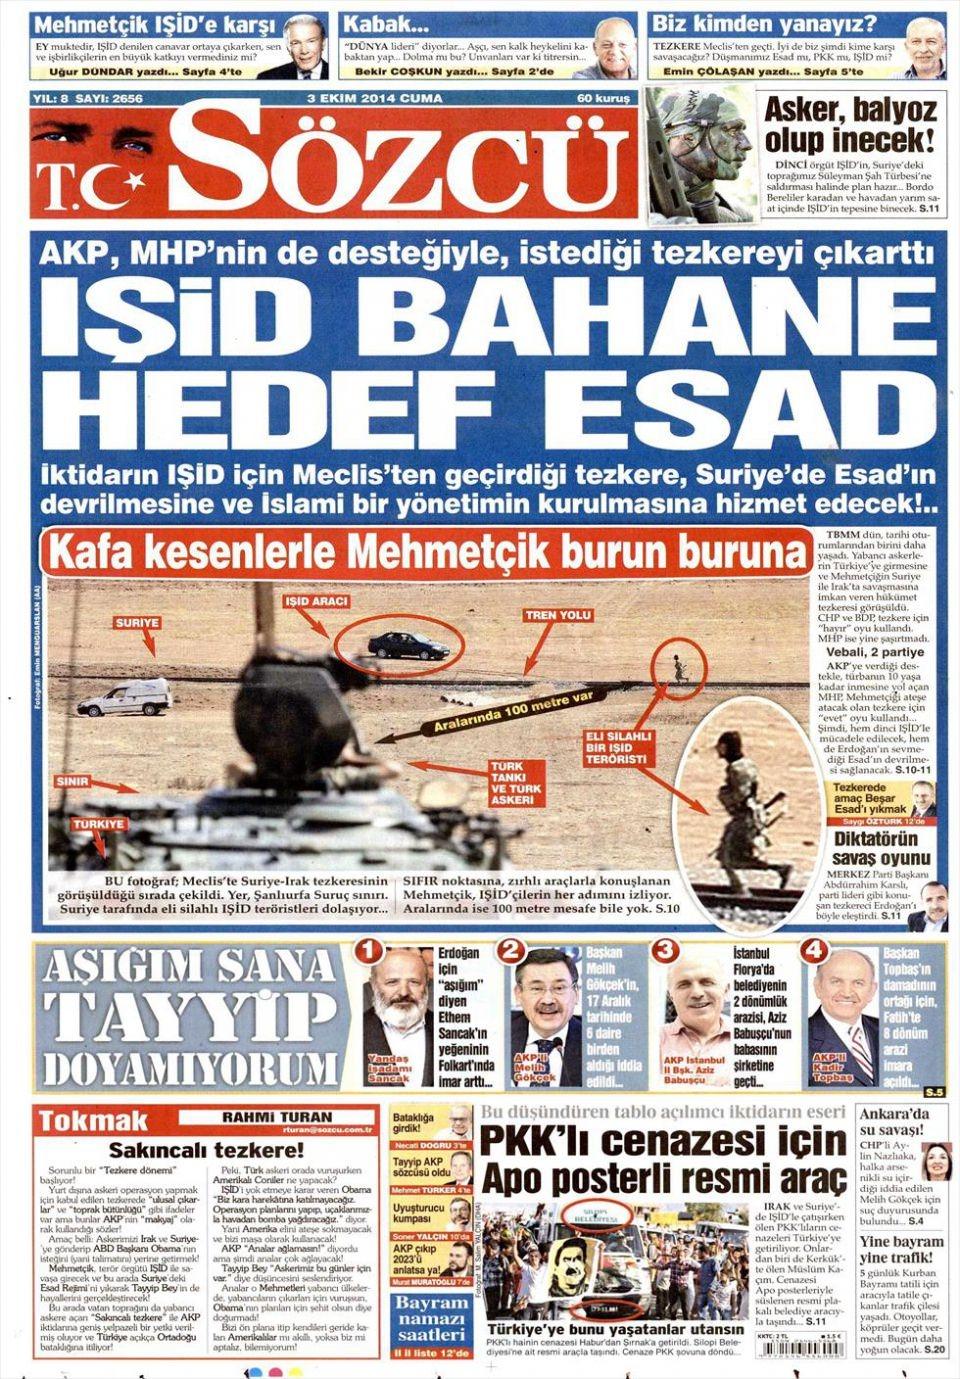 3 Ekim 2014 gazete manşetleri 16